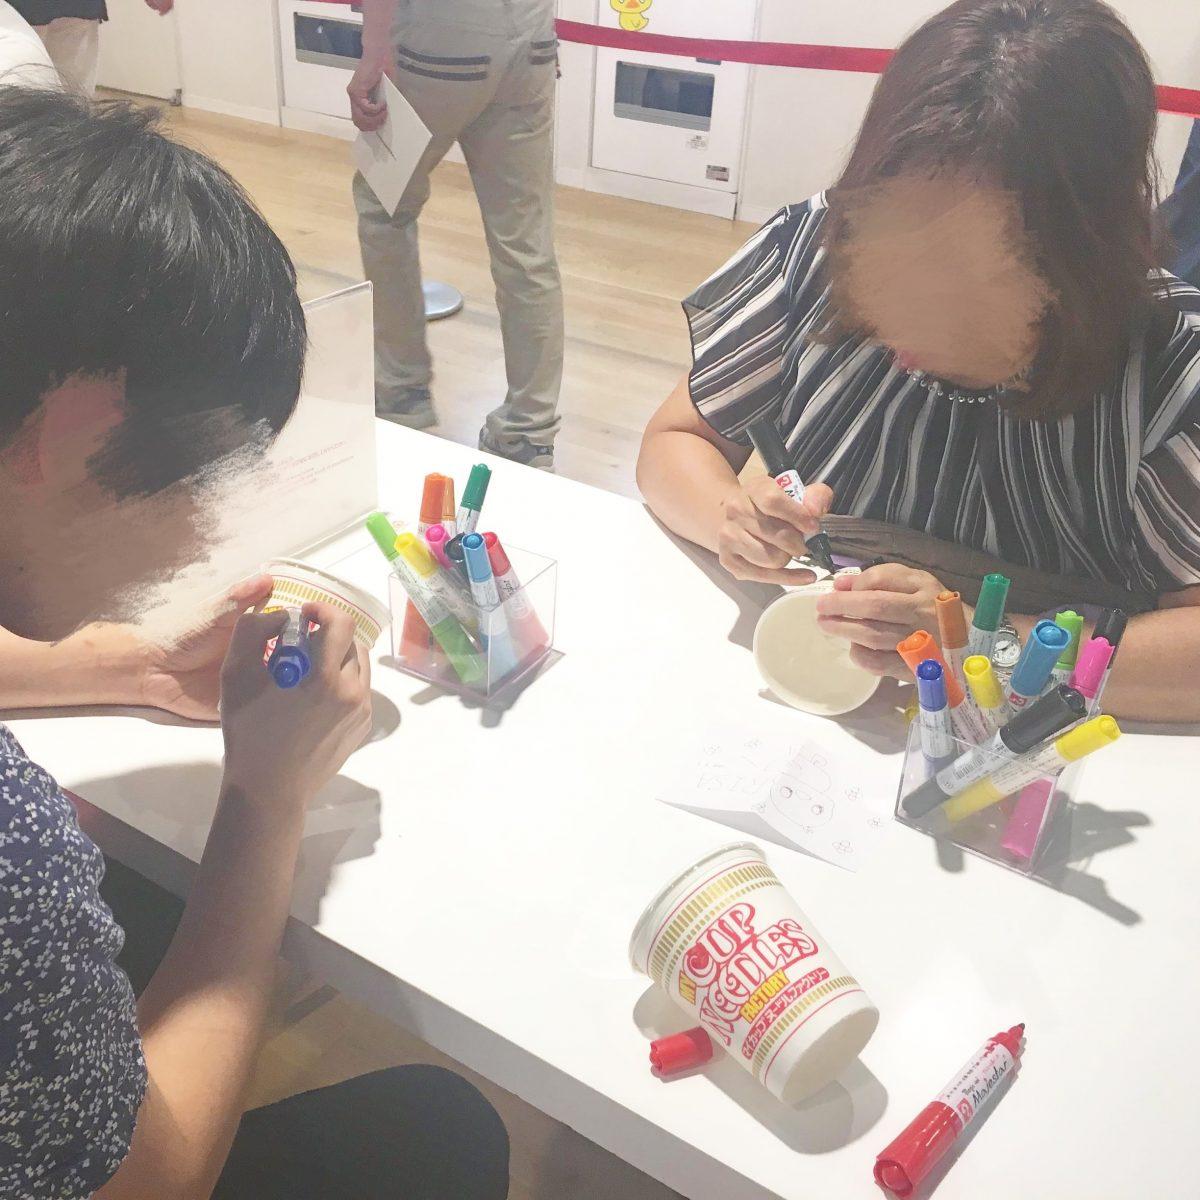 NHK朝ドラ『まんぷく』で注目♡日清カップヌードルミュージアム大阪池田